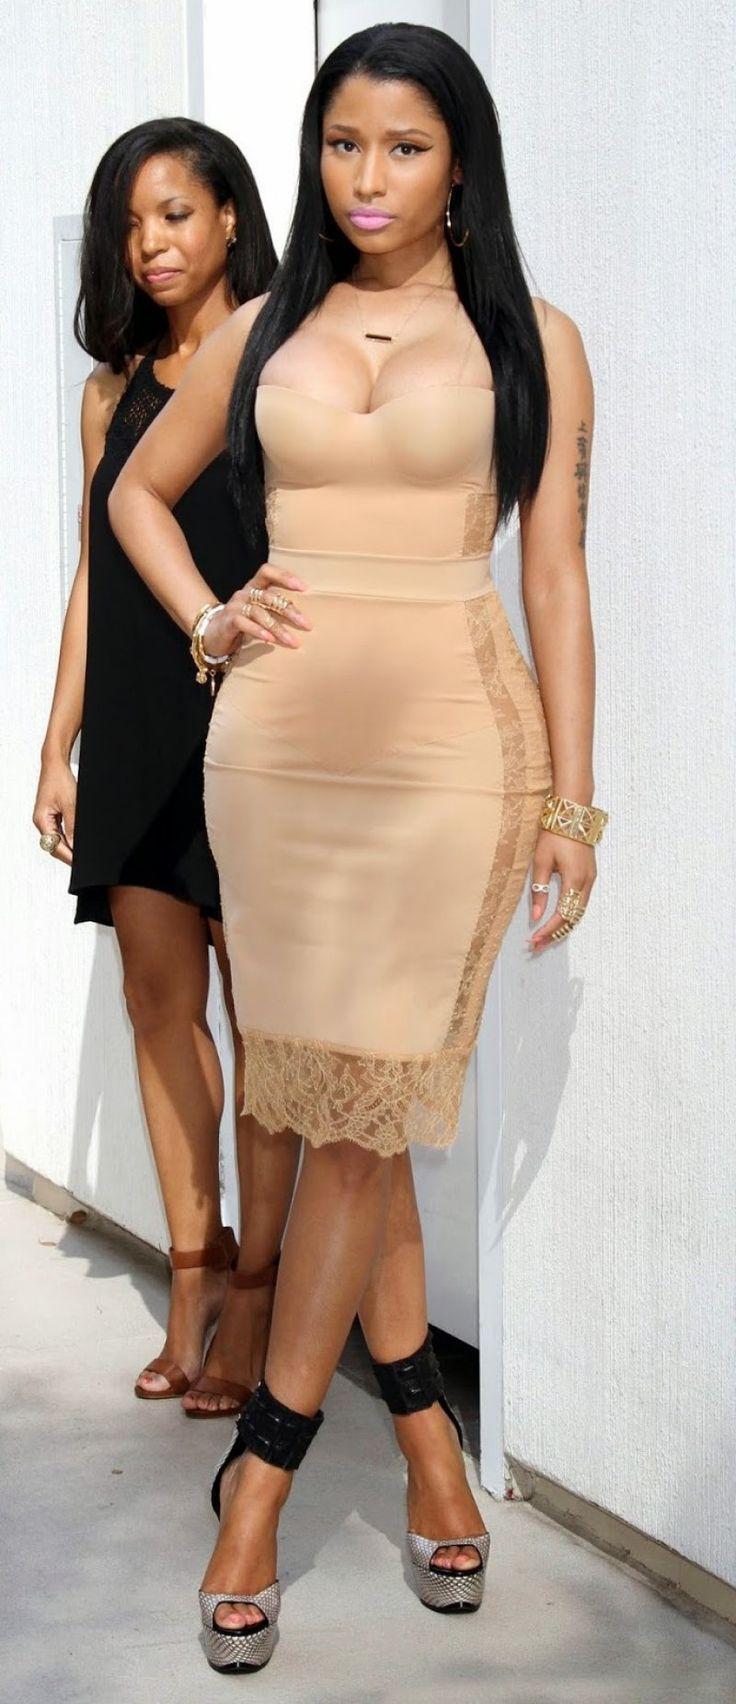 Nicki Minaj's Legs And Feet-23 Sexiest Celebrity Legs And Feet